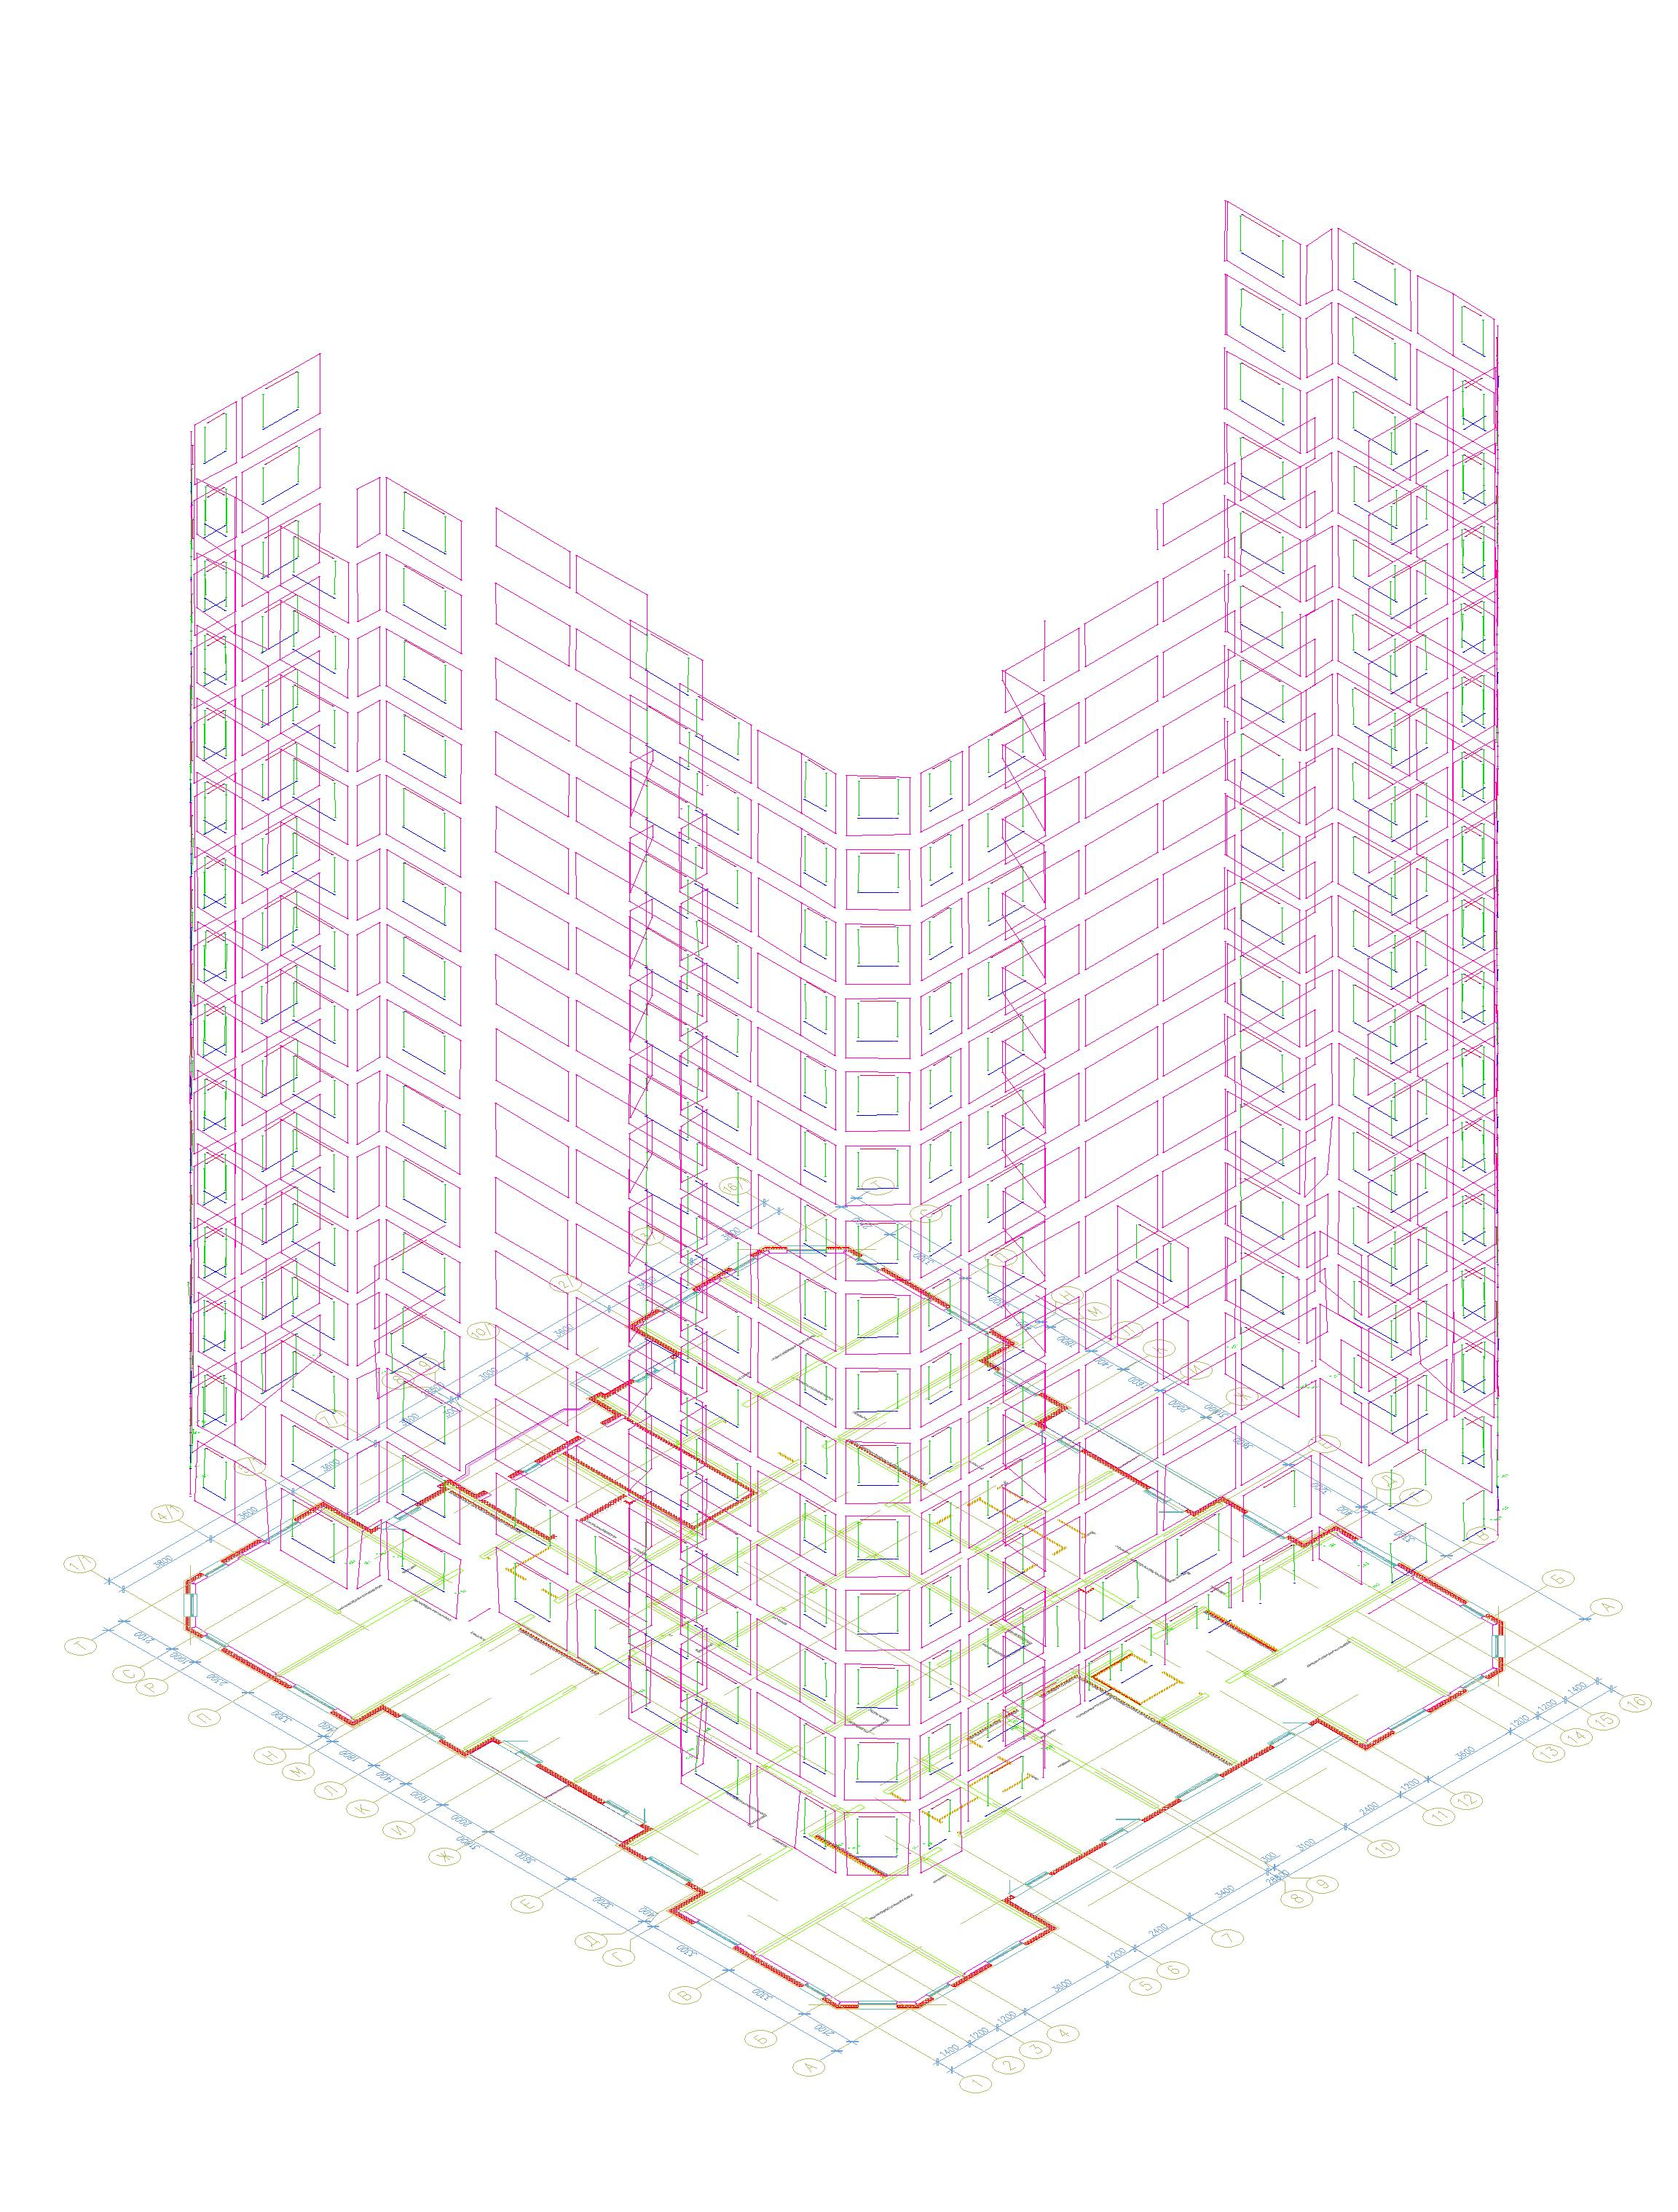 Фасадная съемка для проектирования фасада